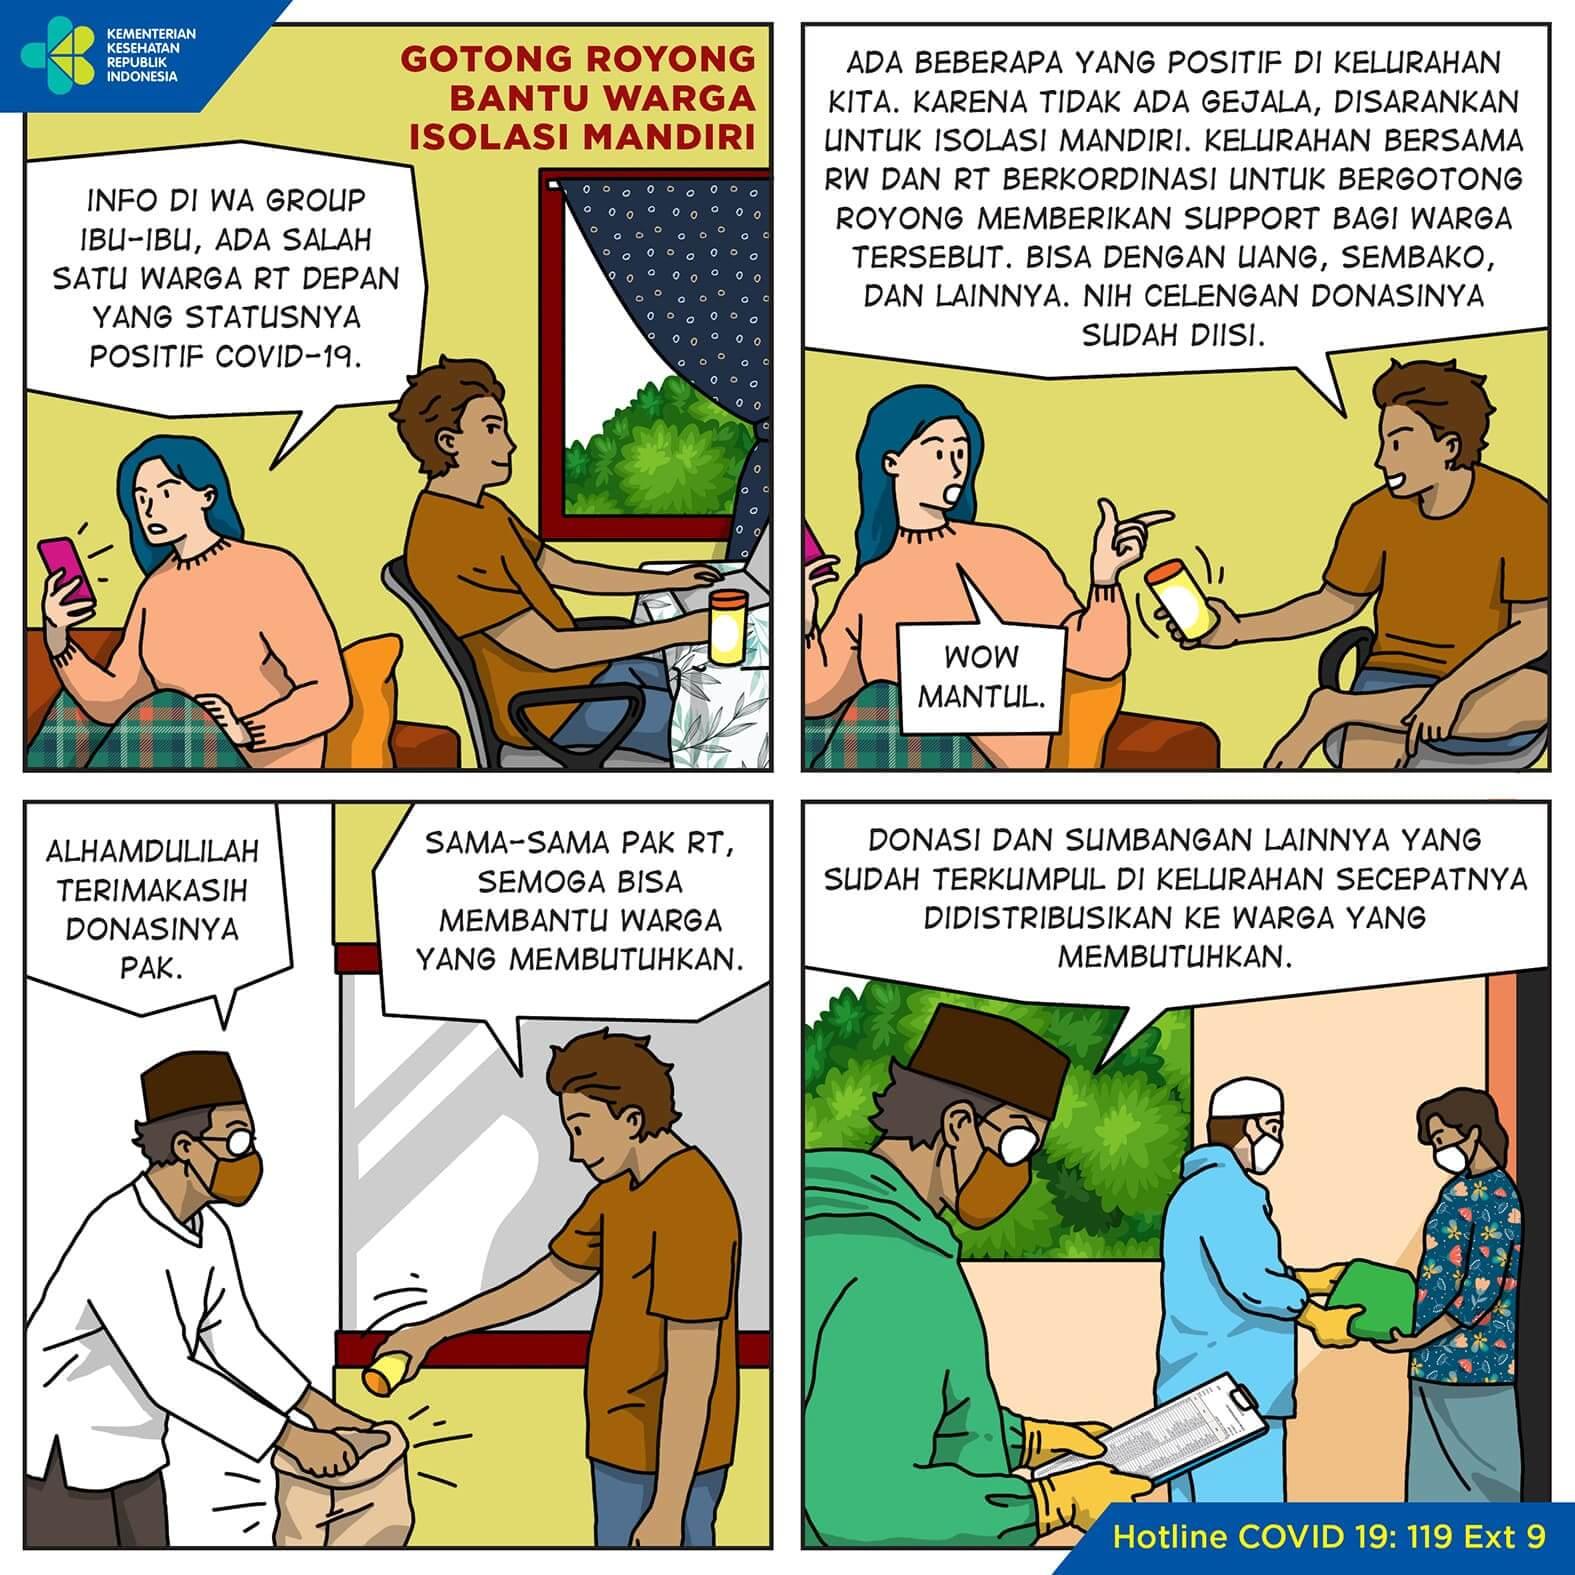 Gotong Royong Bantu Warga Isolasi Mandiri